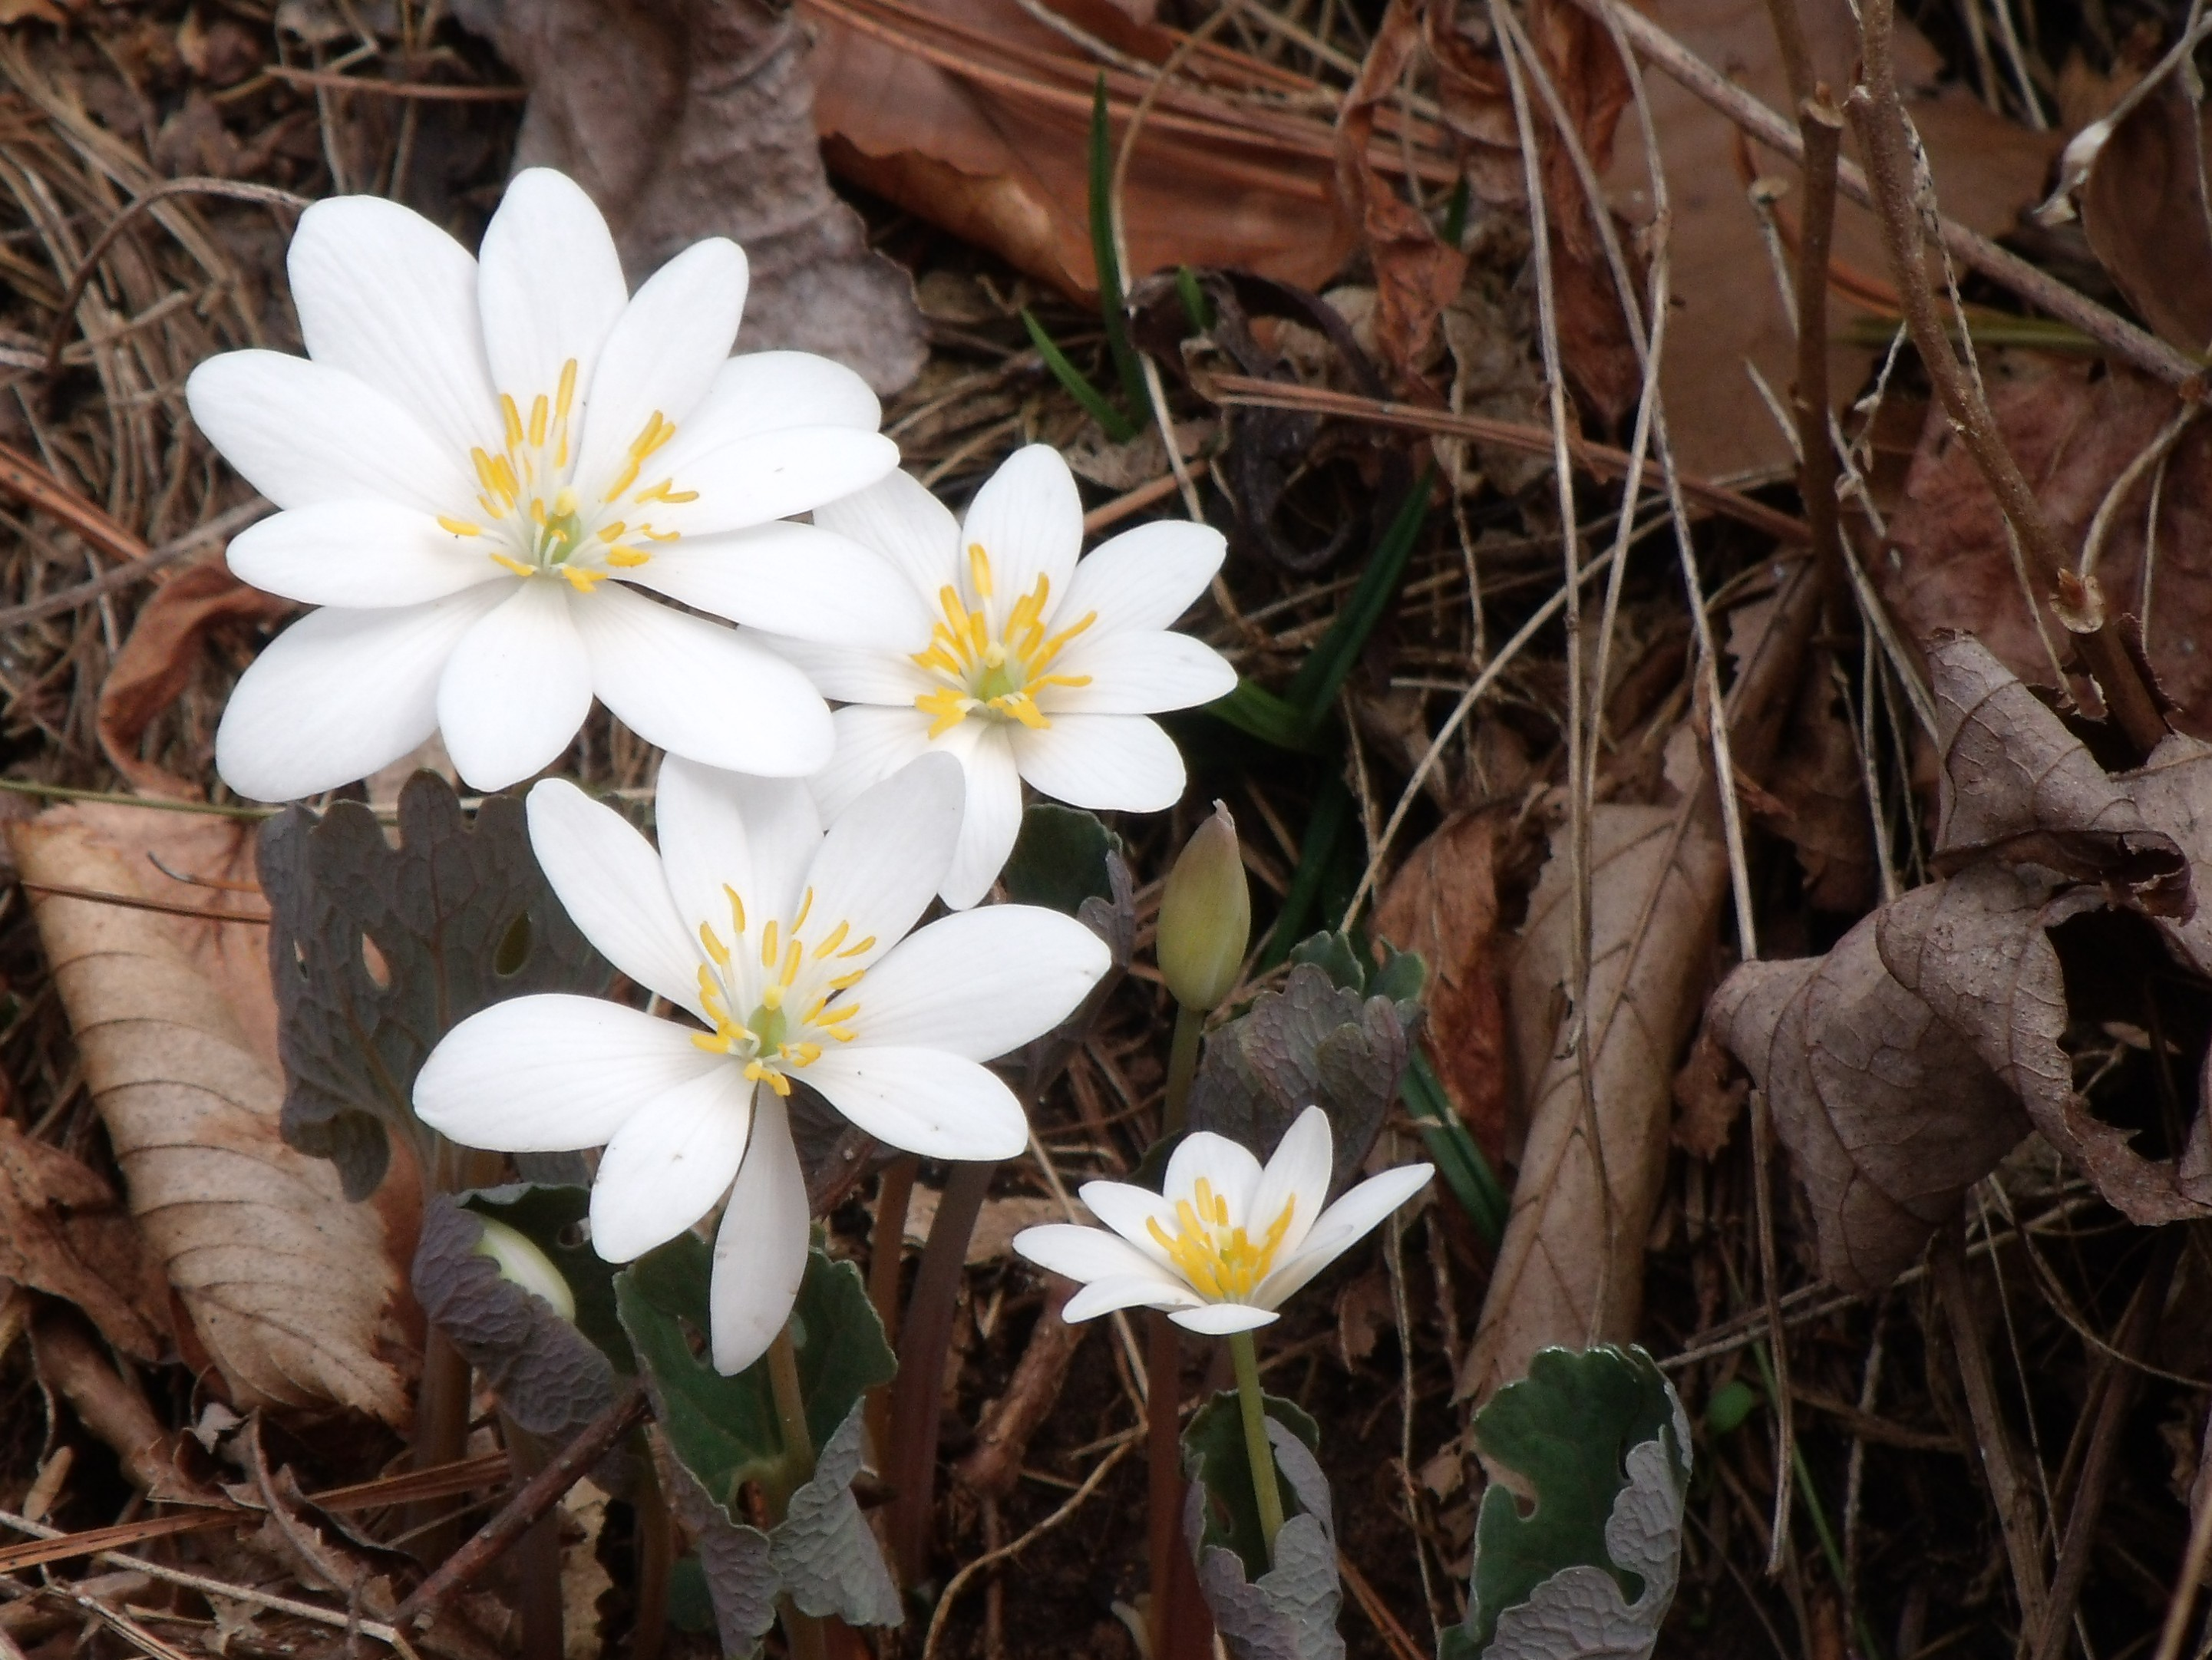 Bloodroot in bloom